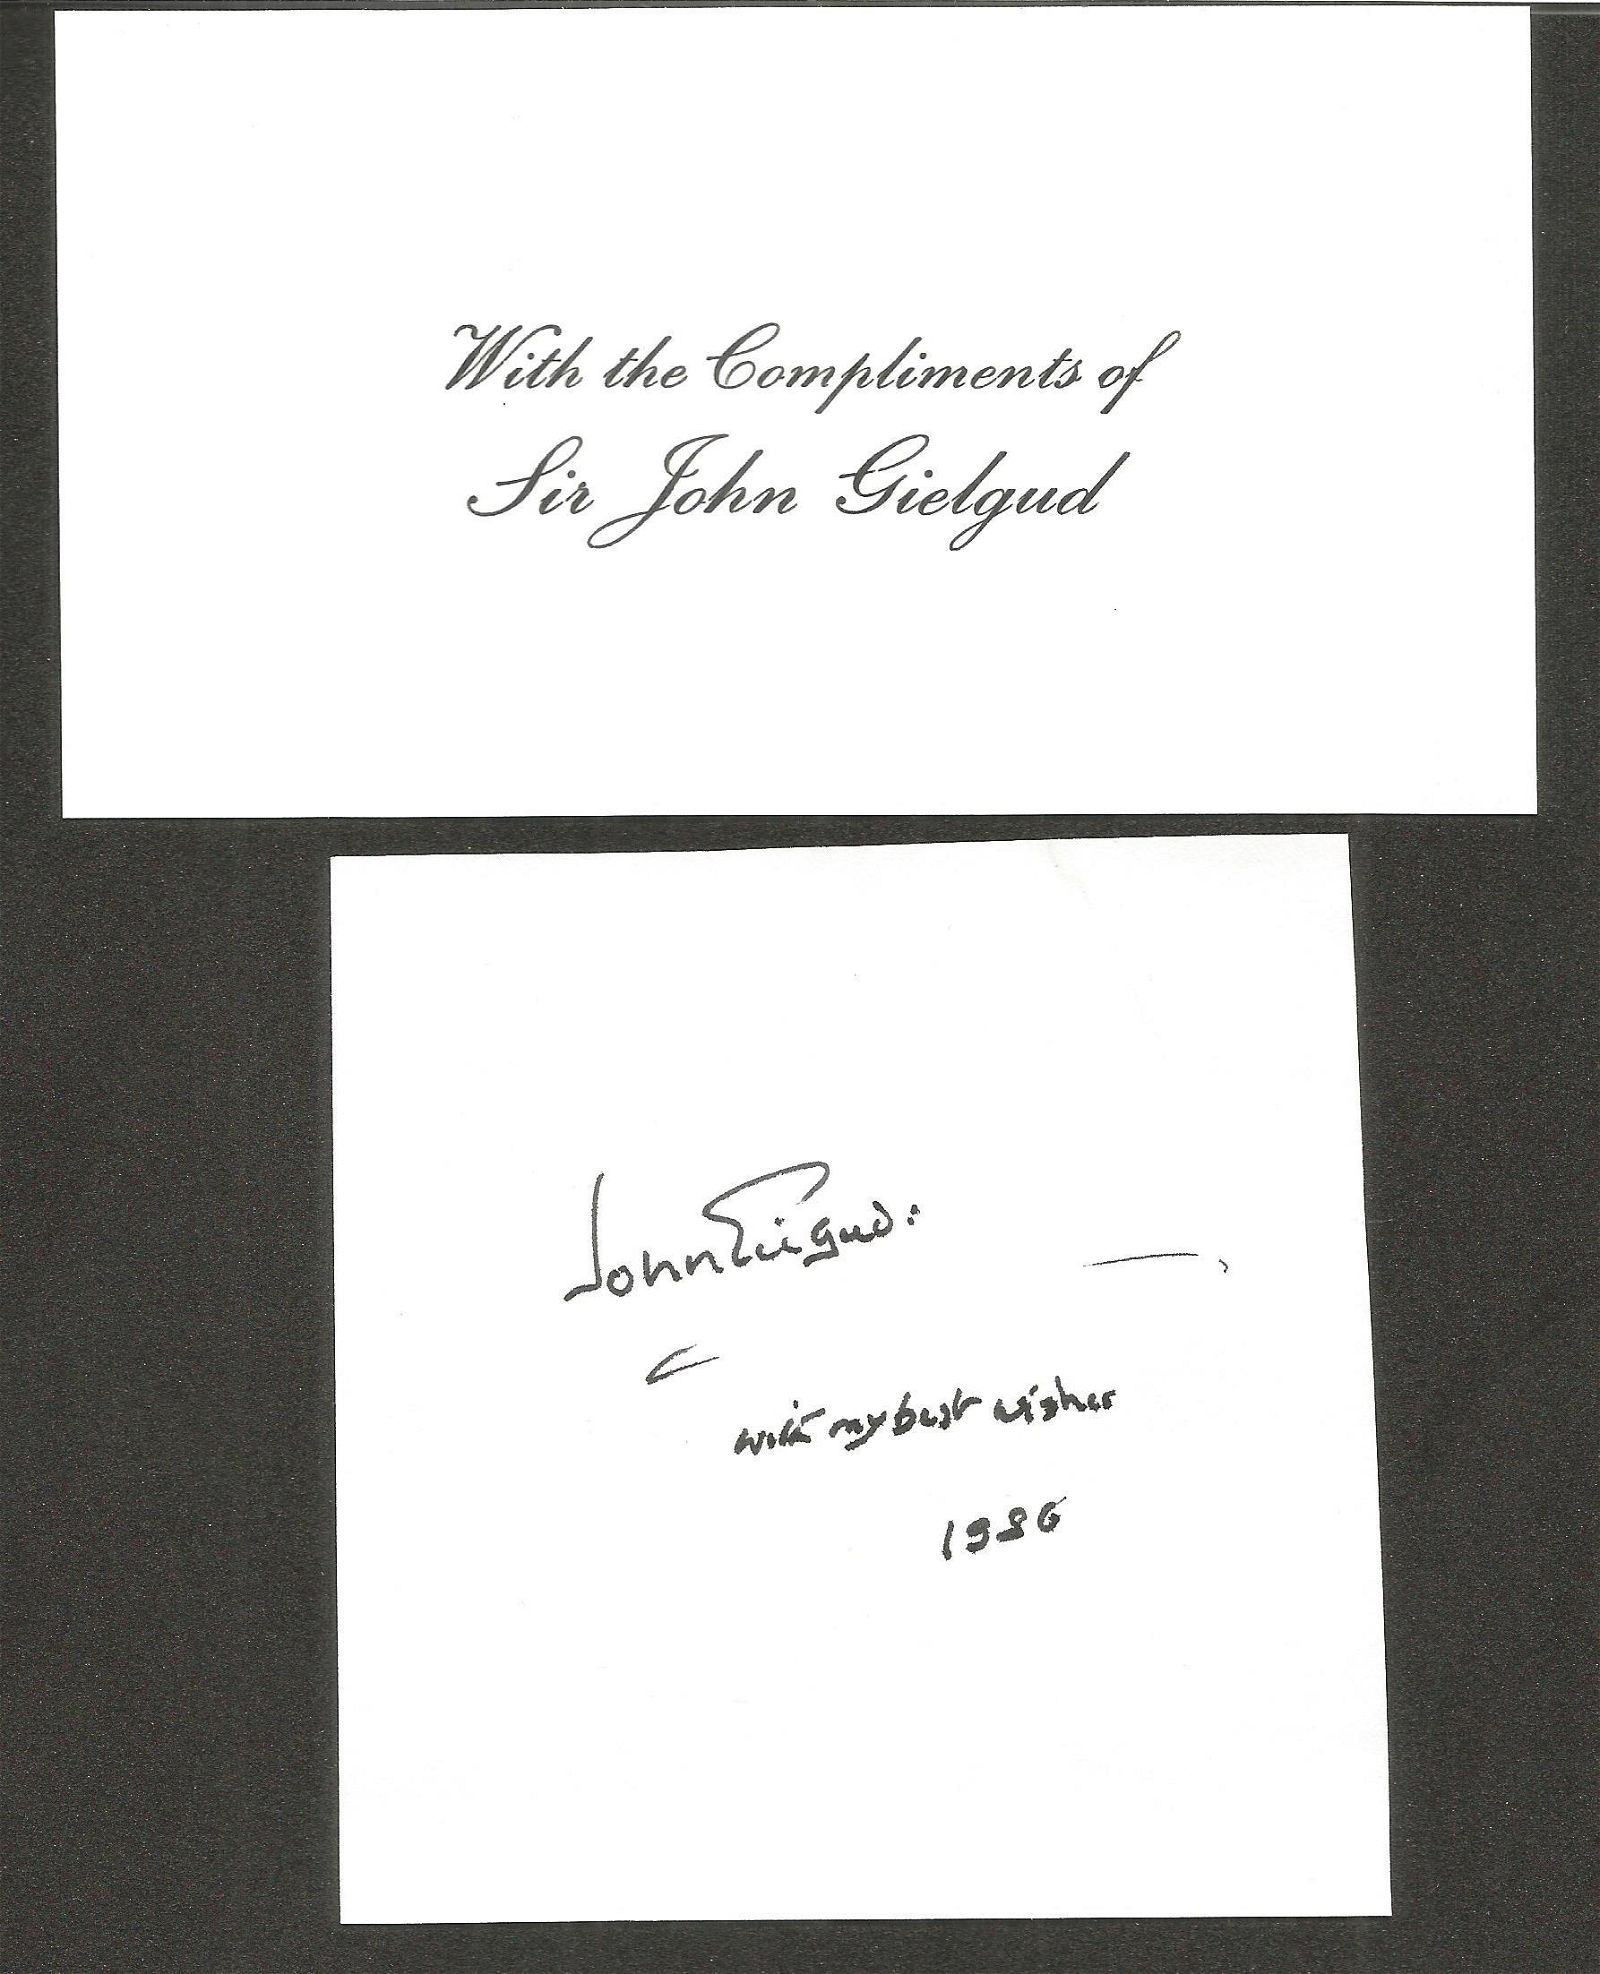 Sir John Gielgud small signature piece. Good condition.